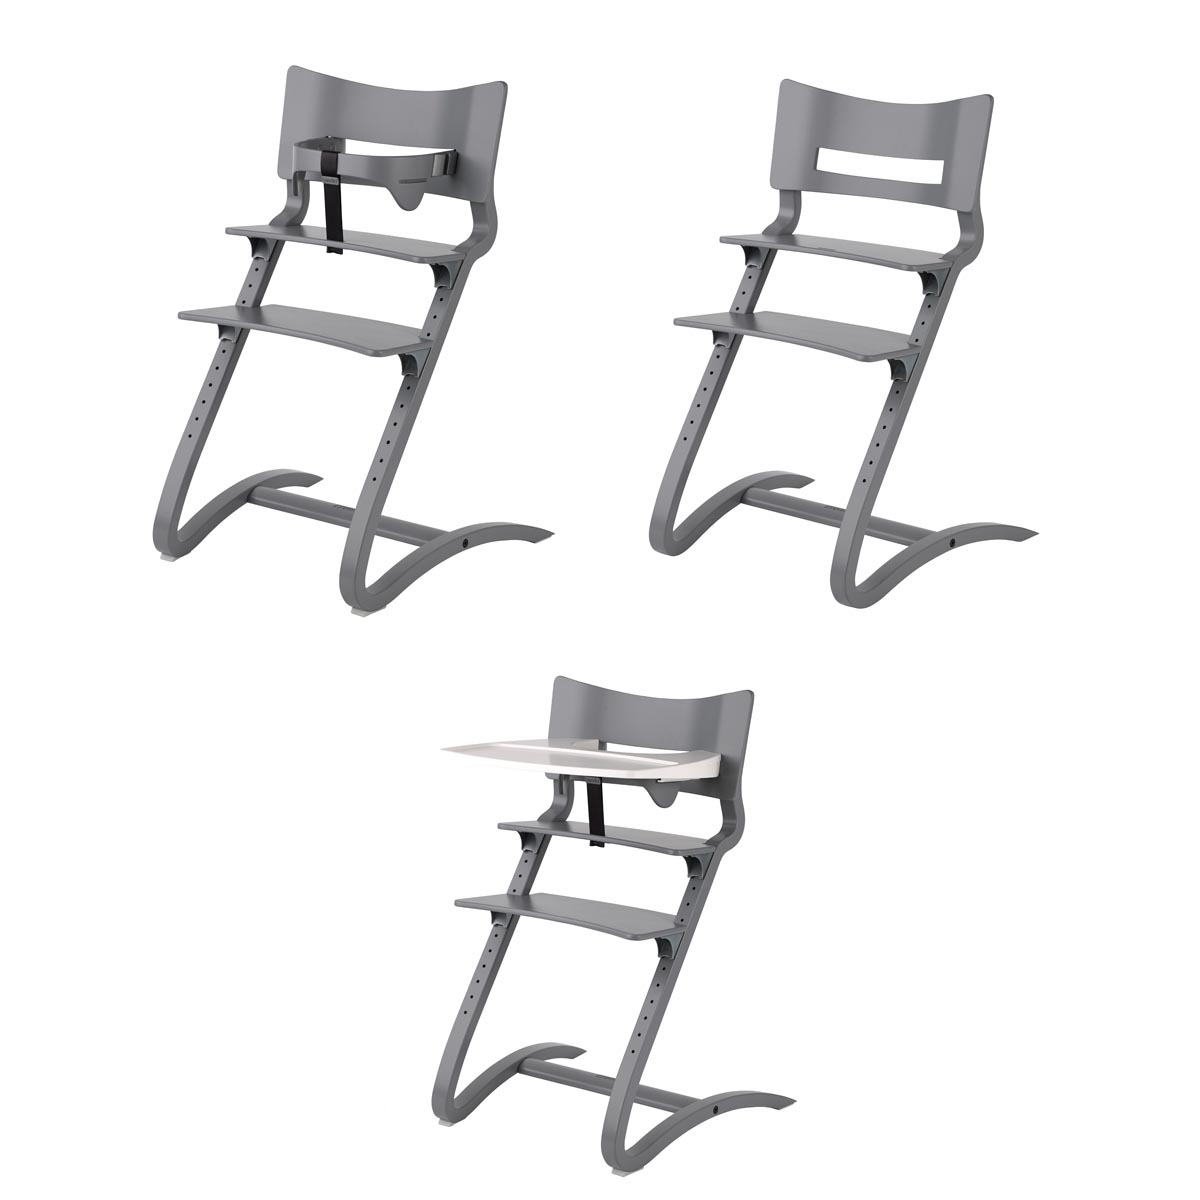 Chaise haute volutive gris chagri achat vente chaise haute - Chaise haute modulable ...